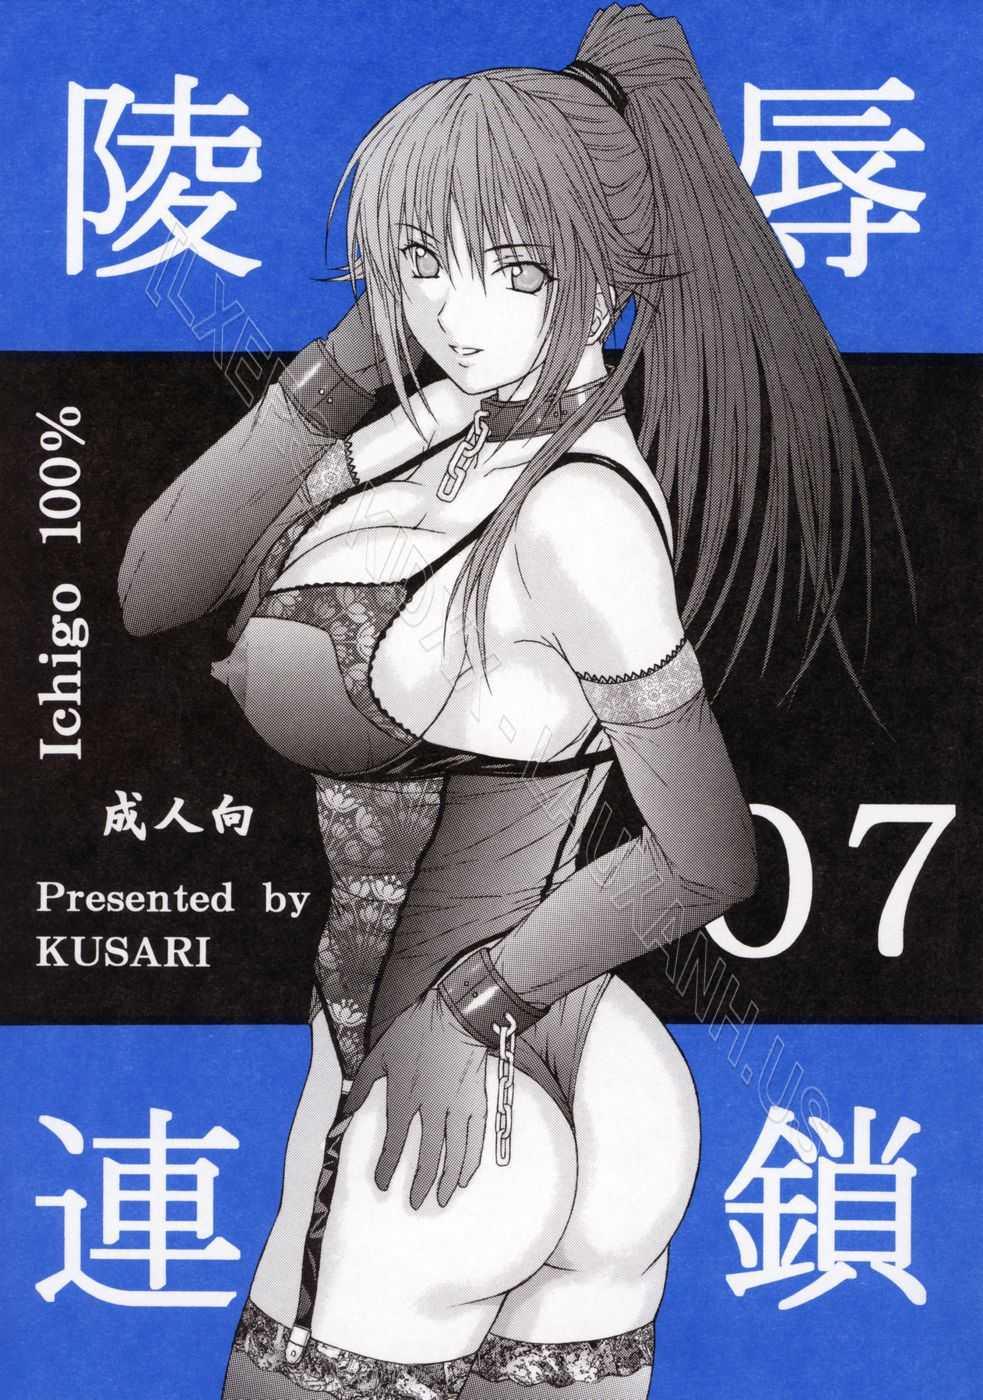 TruyenHay.Com - Ảnh 1 - Ryoujoku Rensa Chapter 7